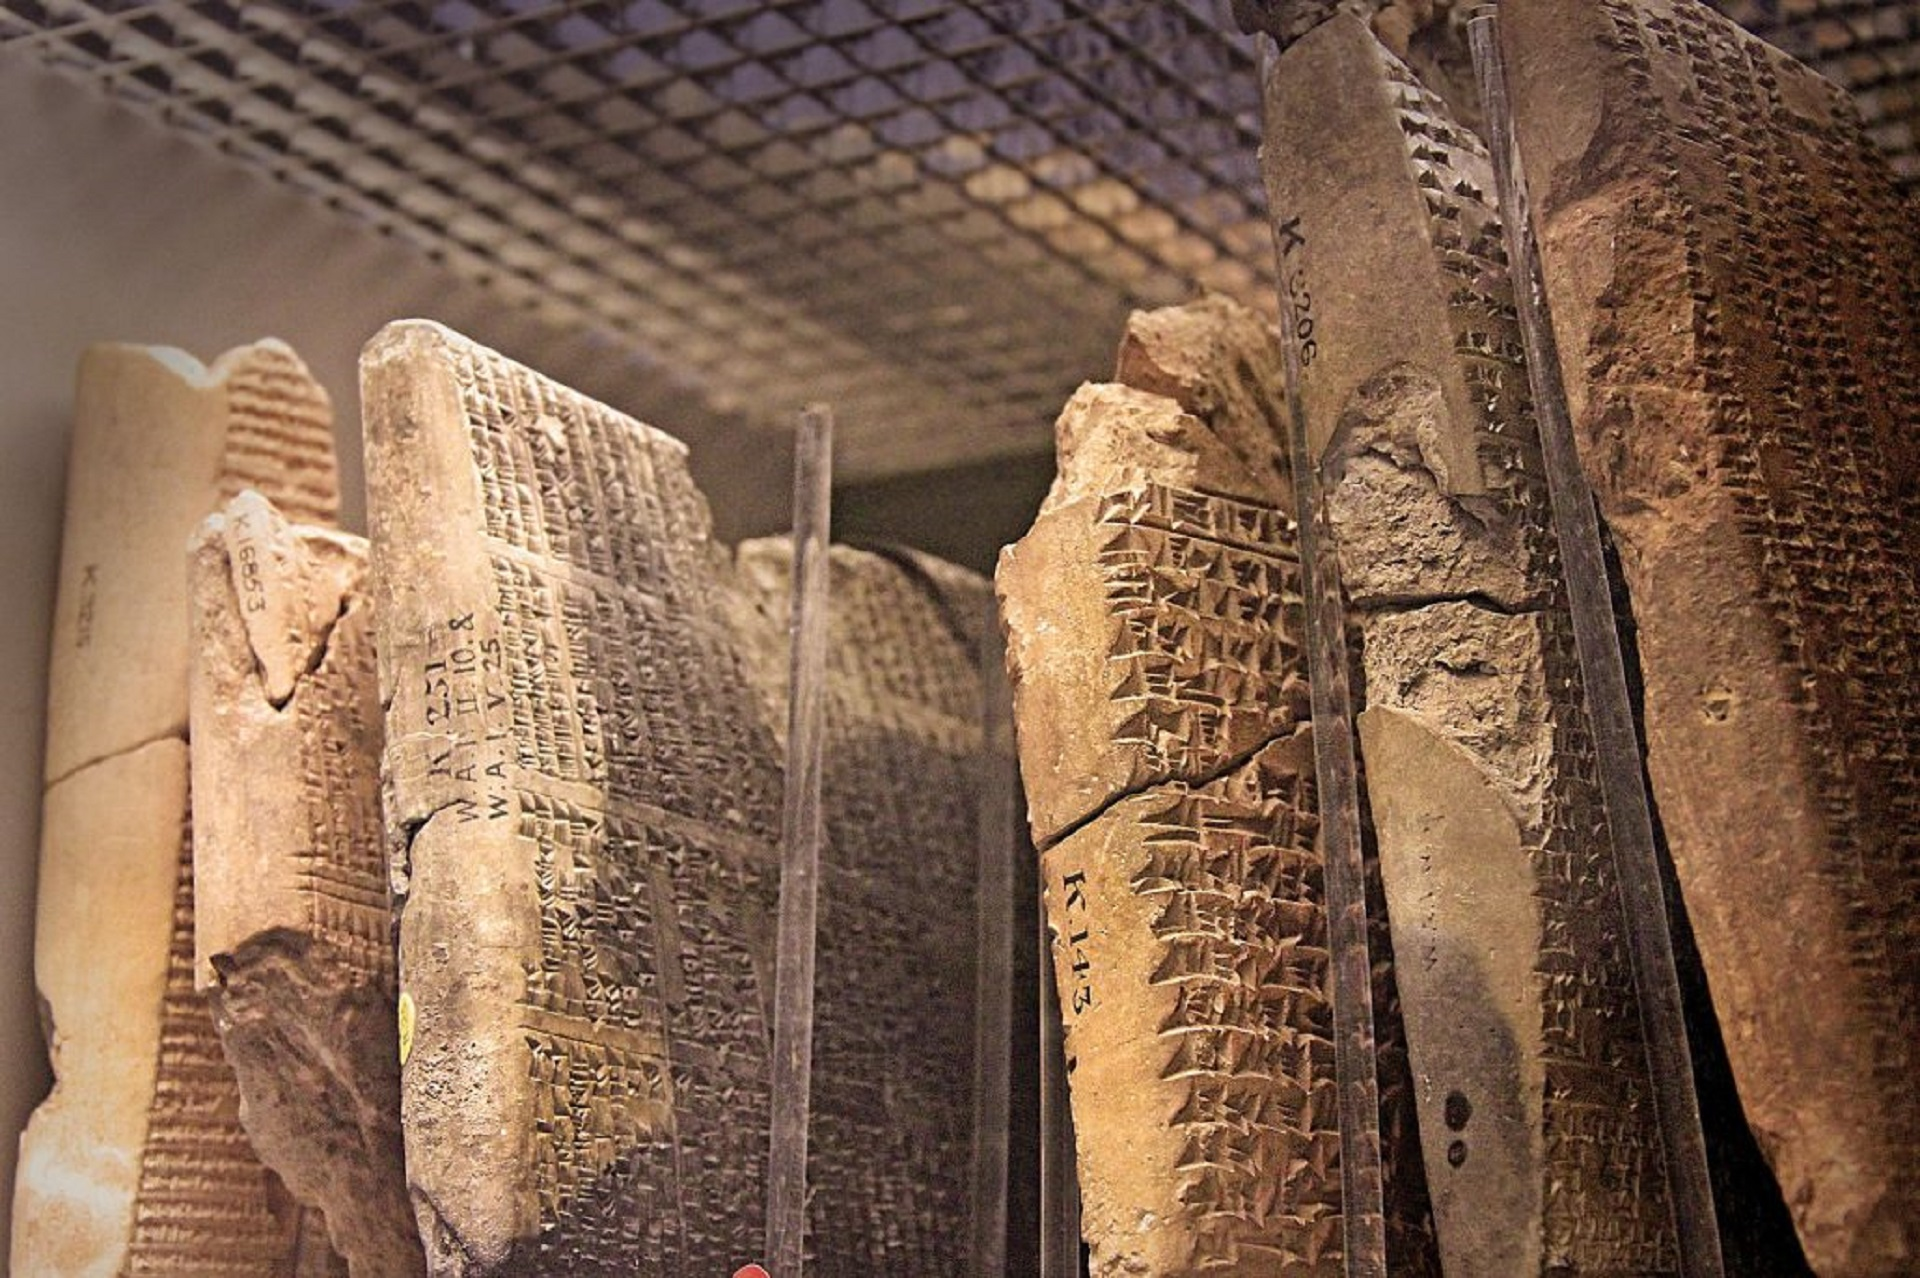 Библиотека ассирийского царя ашшурбанипала картинки